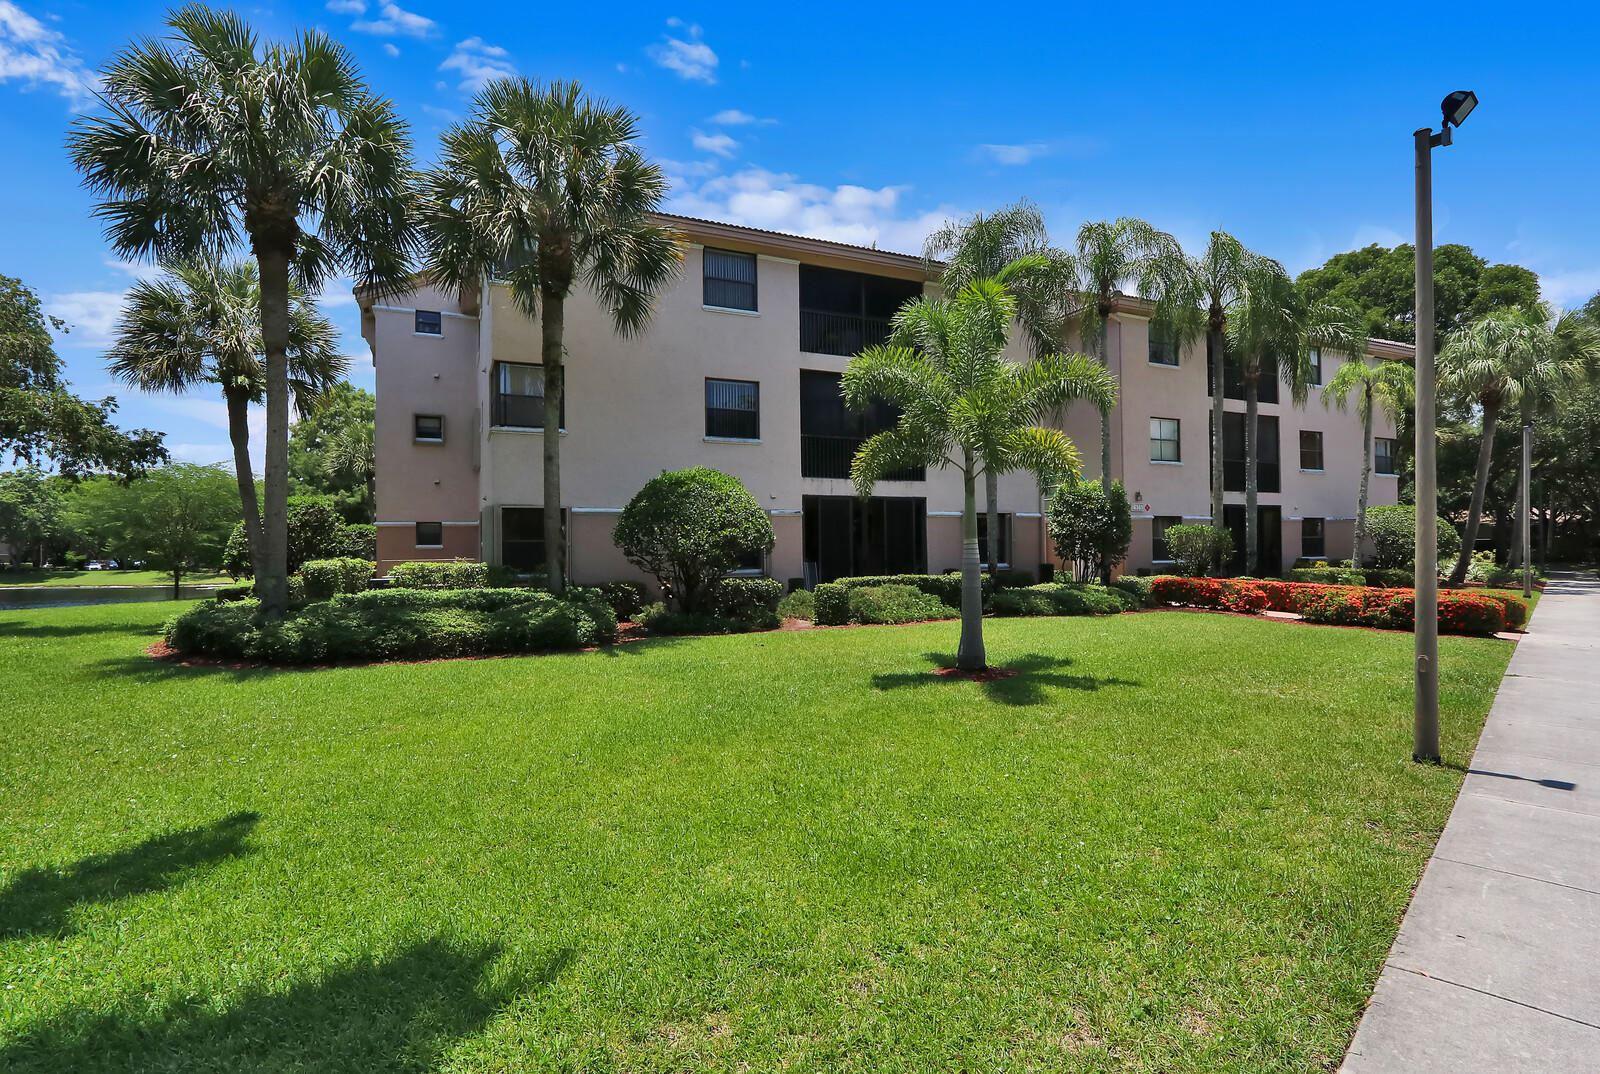 4141 Coral Tree Circle #345, Coconut Creek, FL 33073 - #: RX-10639943